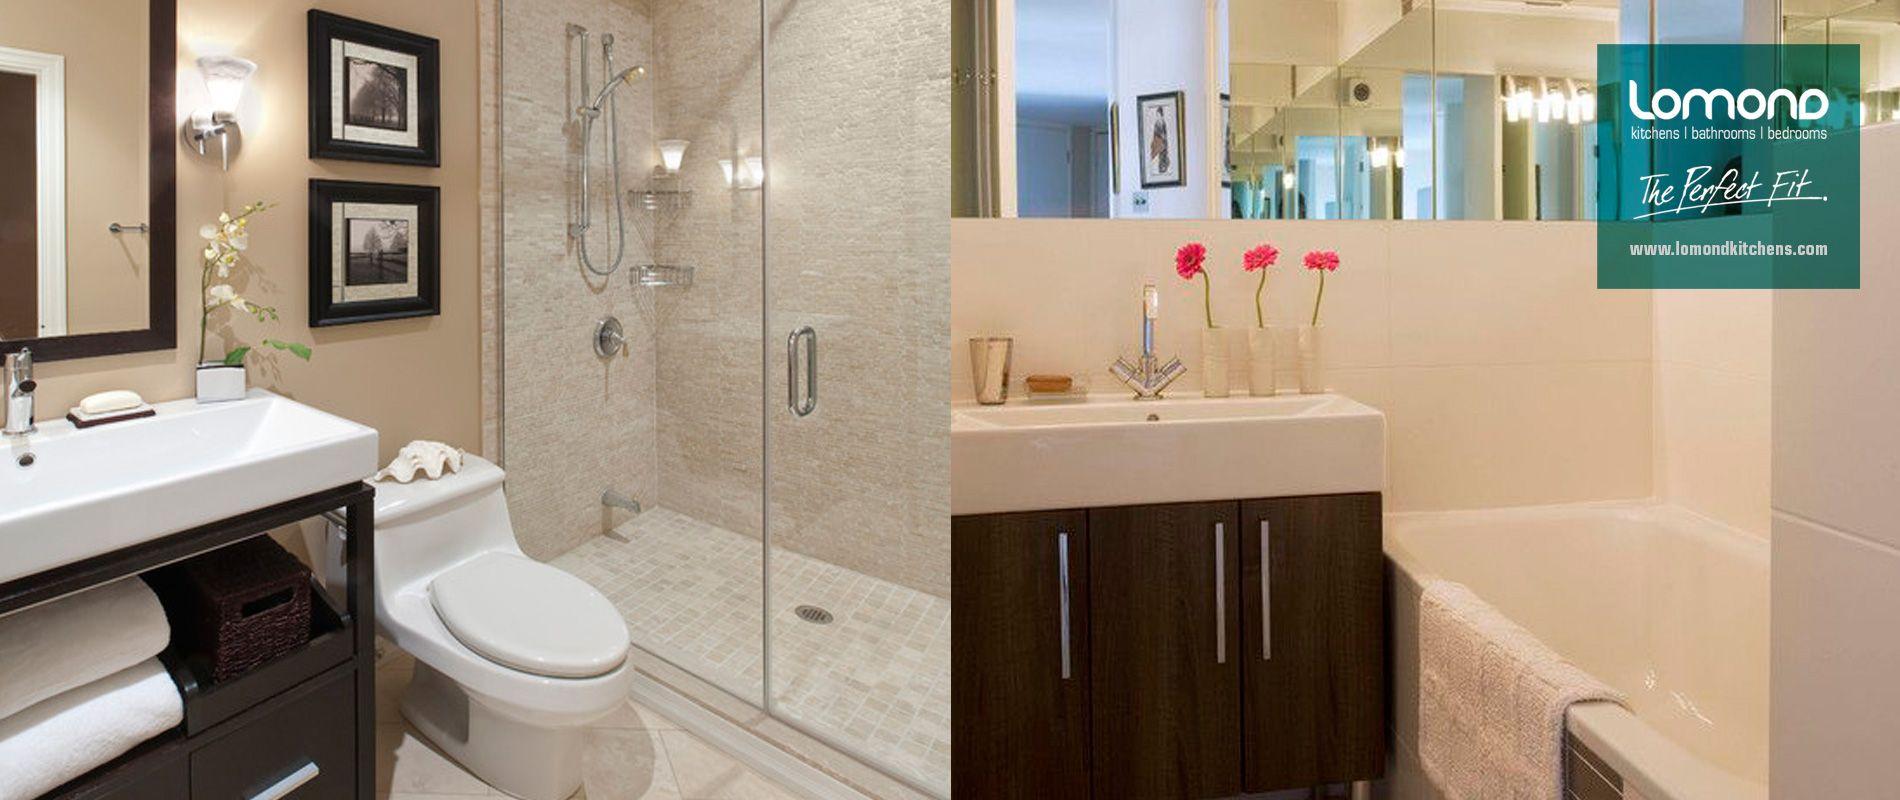 Small Bathroom Design Glasgow  Ideas 20172018  Pinterest Unique Bathroom Designers Glasgow Decorating Design